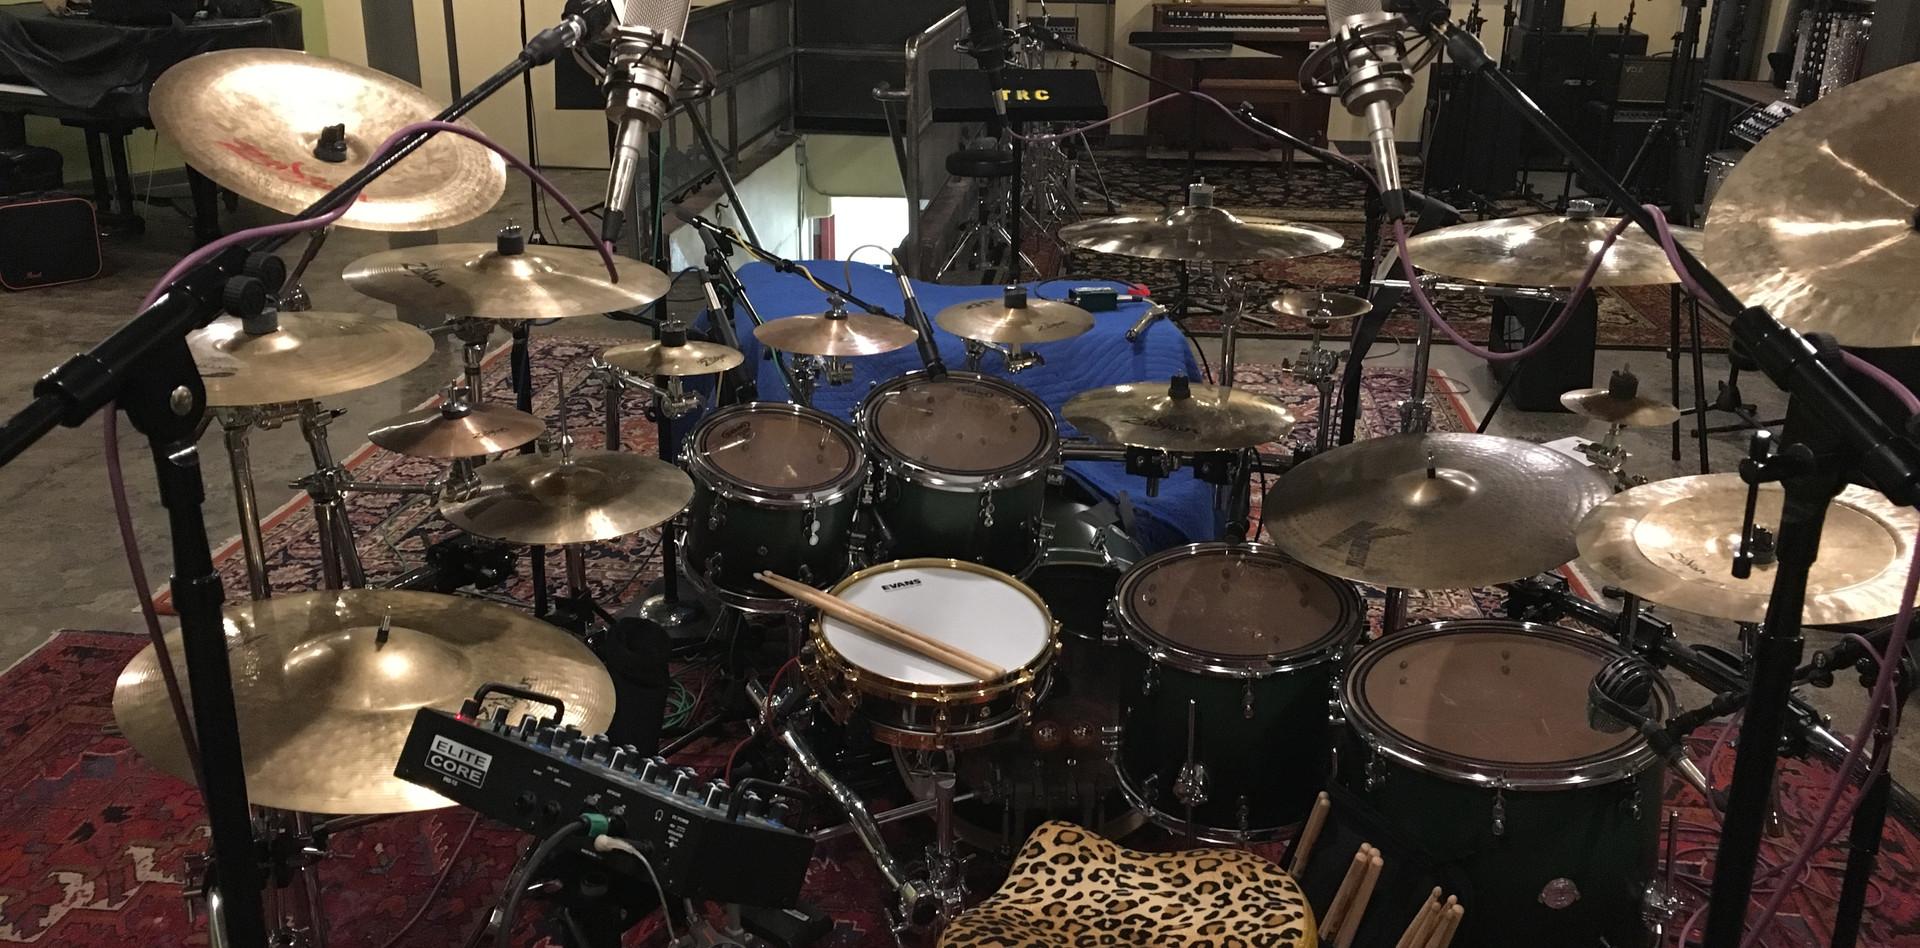 TRC_Drums_1